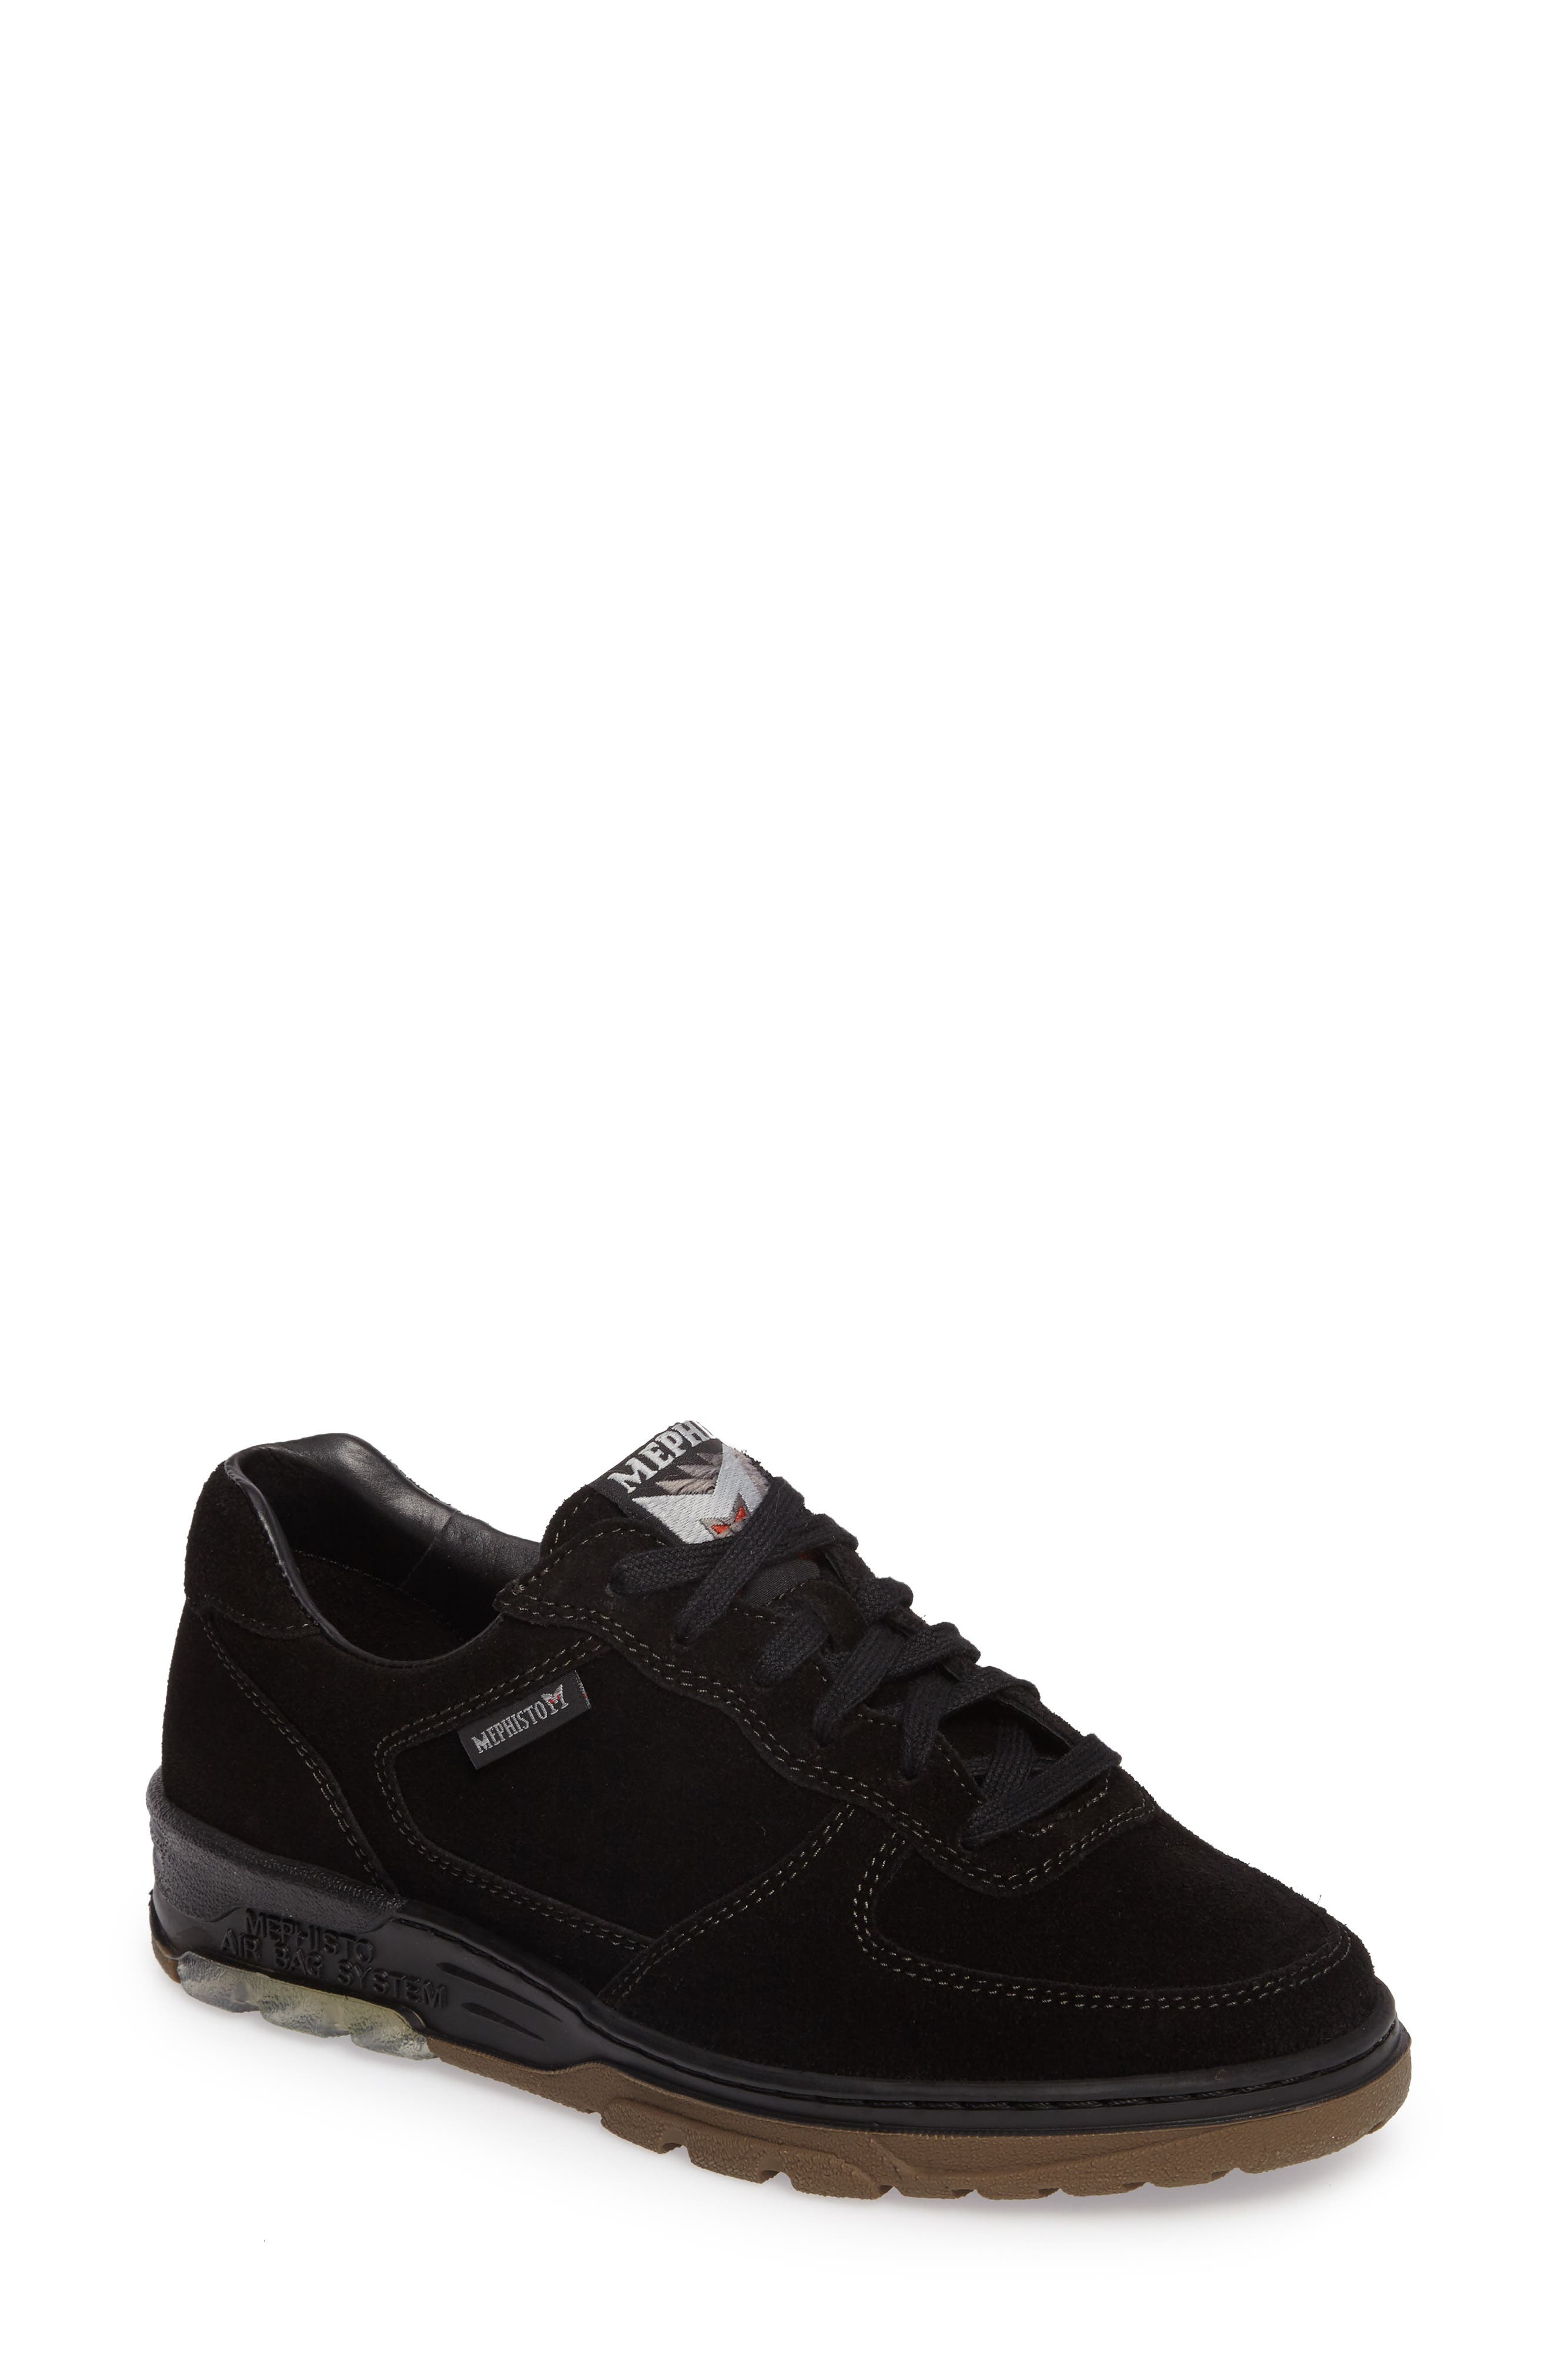 Nykita Sneaker,                             Main thumbnail 1, color,                             BLACK SUEDE